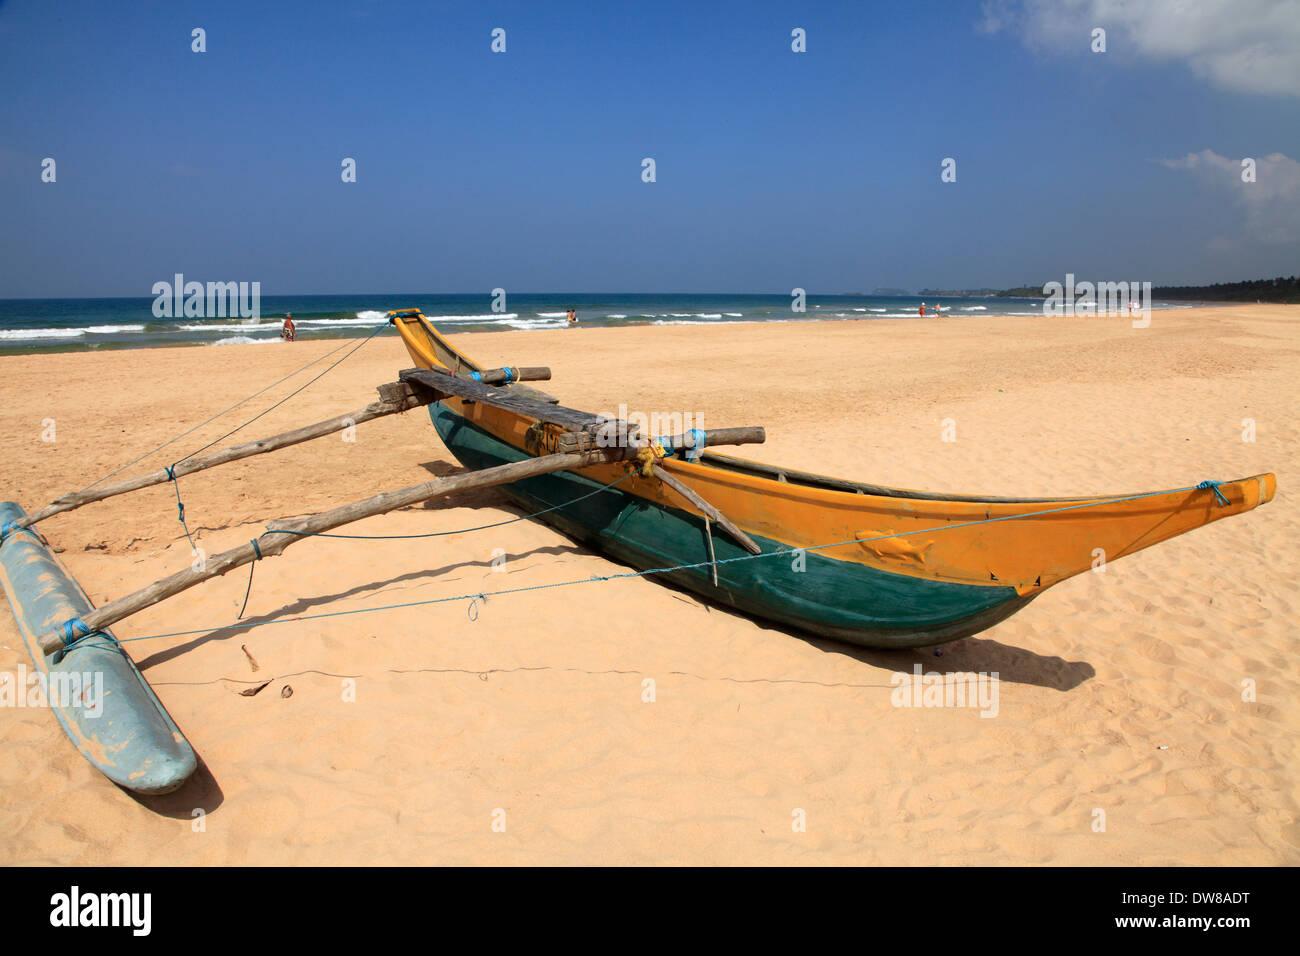 Sri Lanka, Bentota, beach, outrigger canoe, Stock Photo